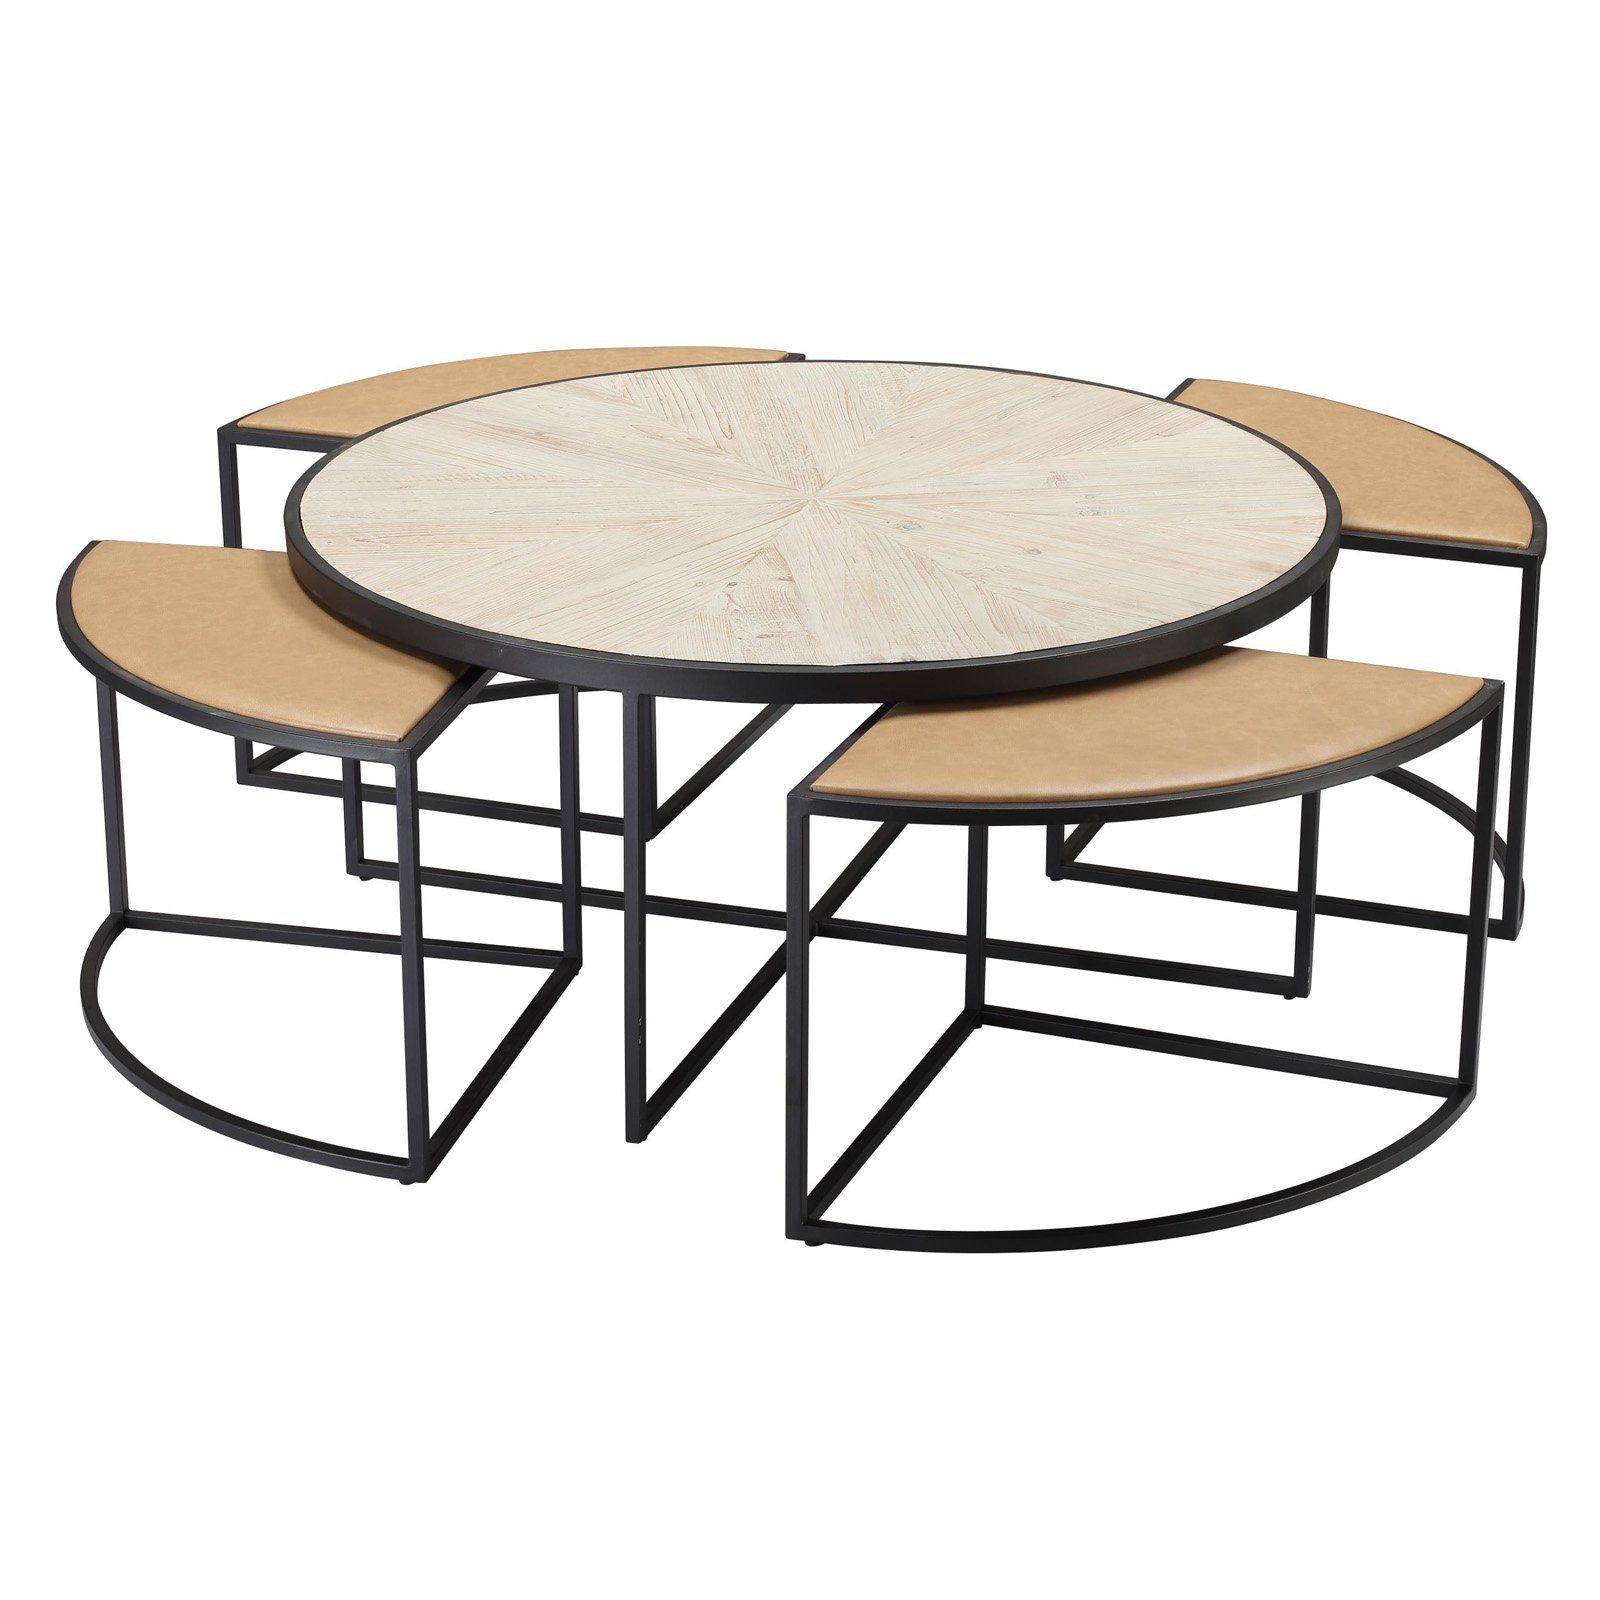 Coffee Table Height Standard Coffee Table Measurements Coffee Table Size Coffee Table Height [ 1080 x 1348 Pixel ]